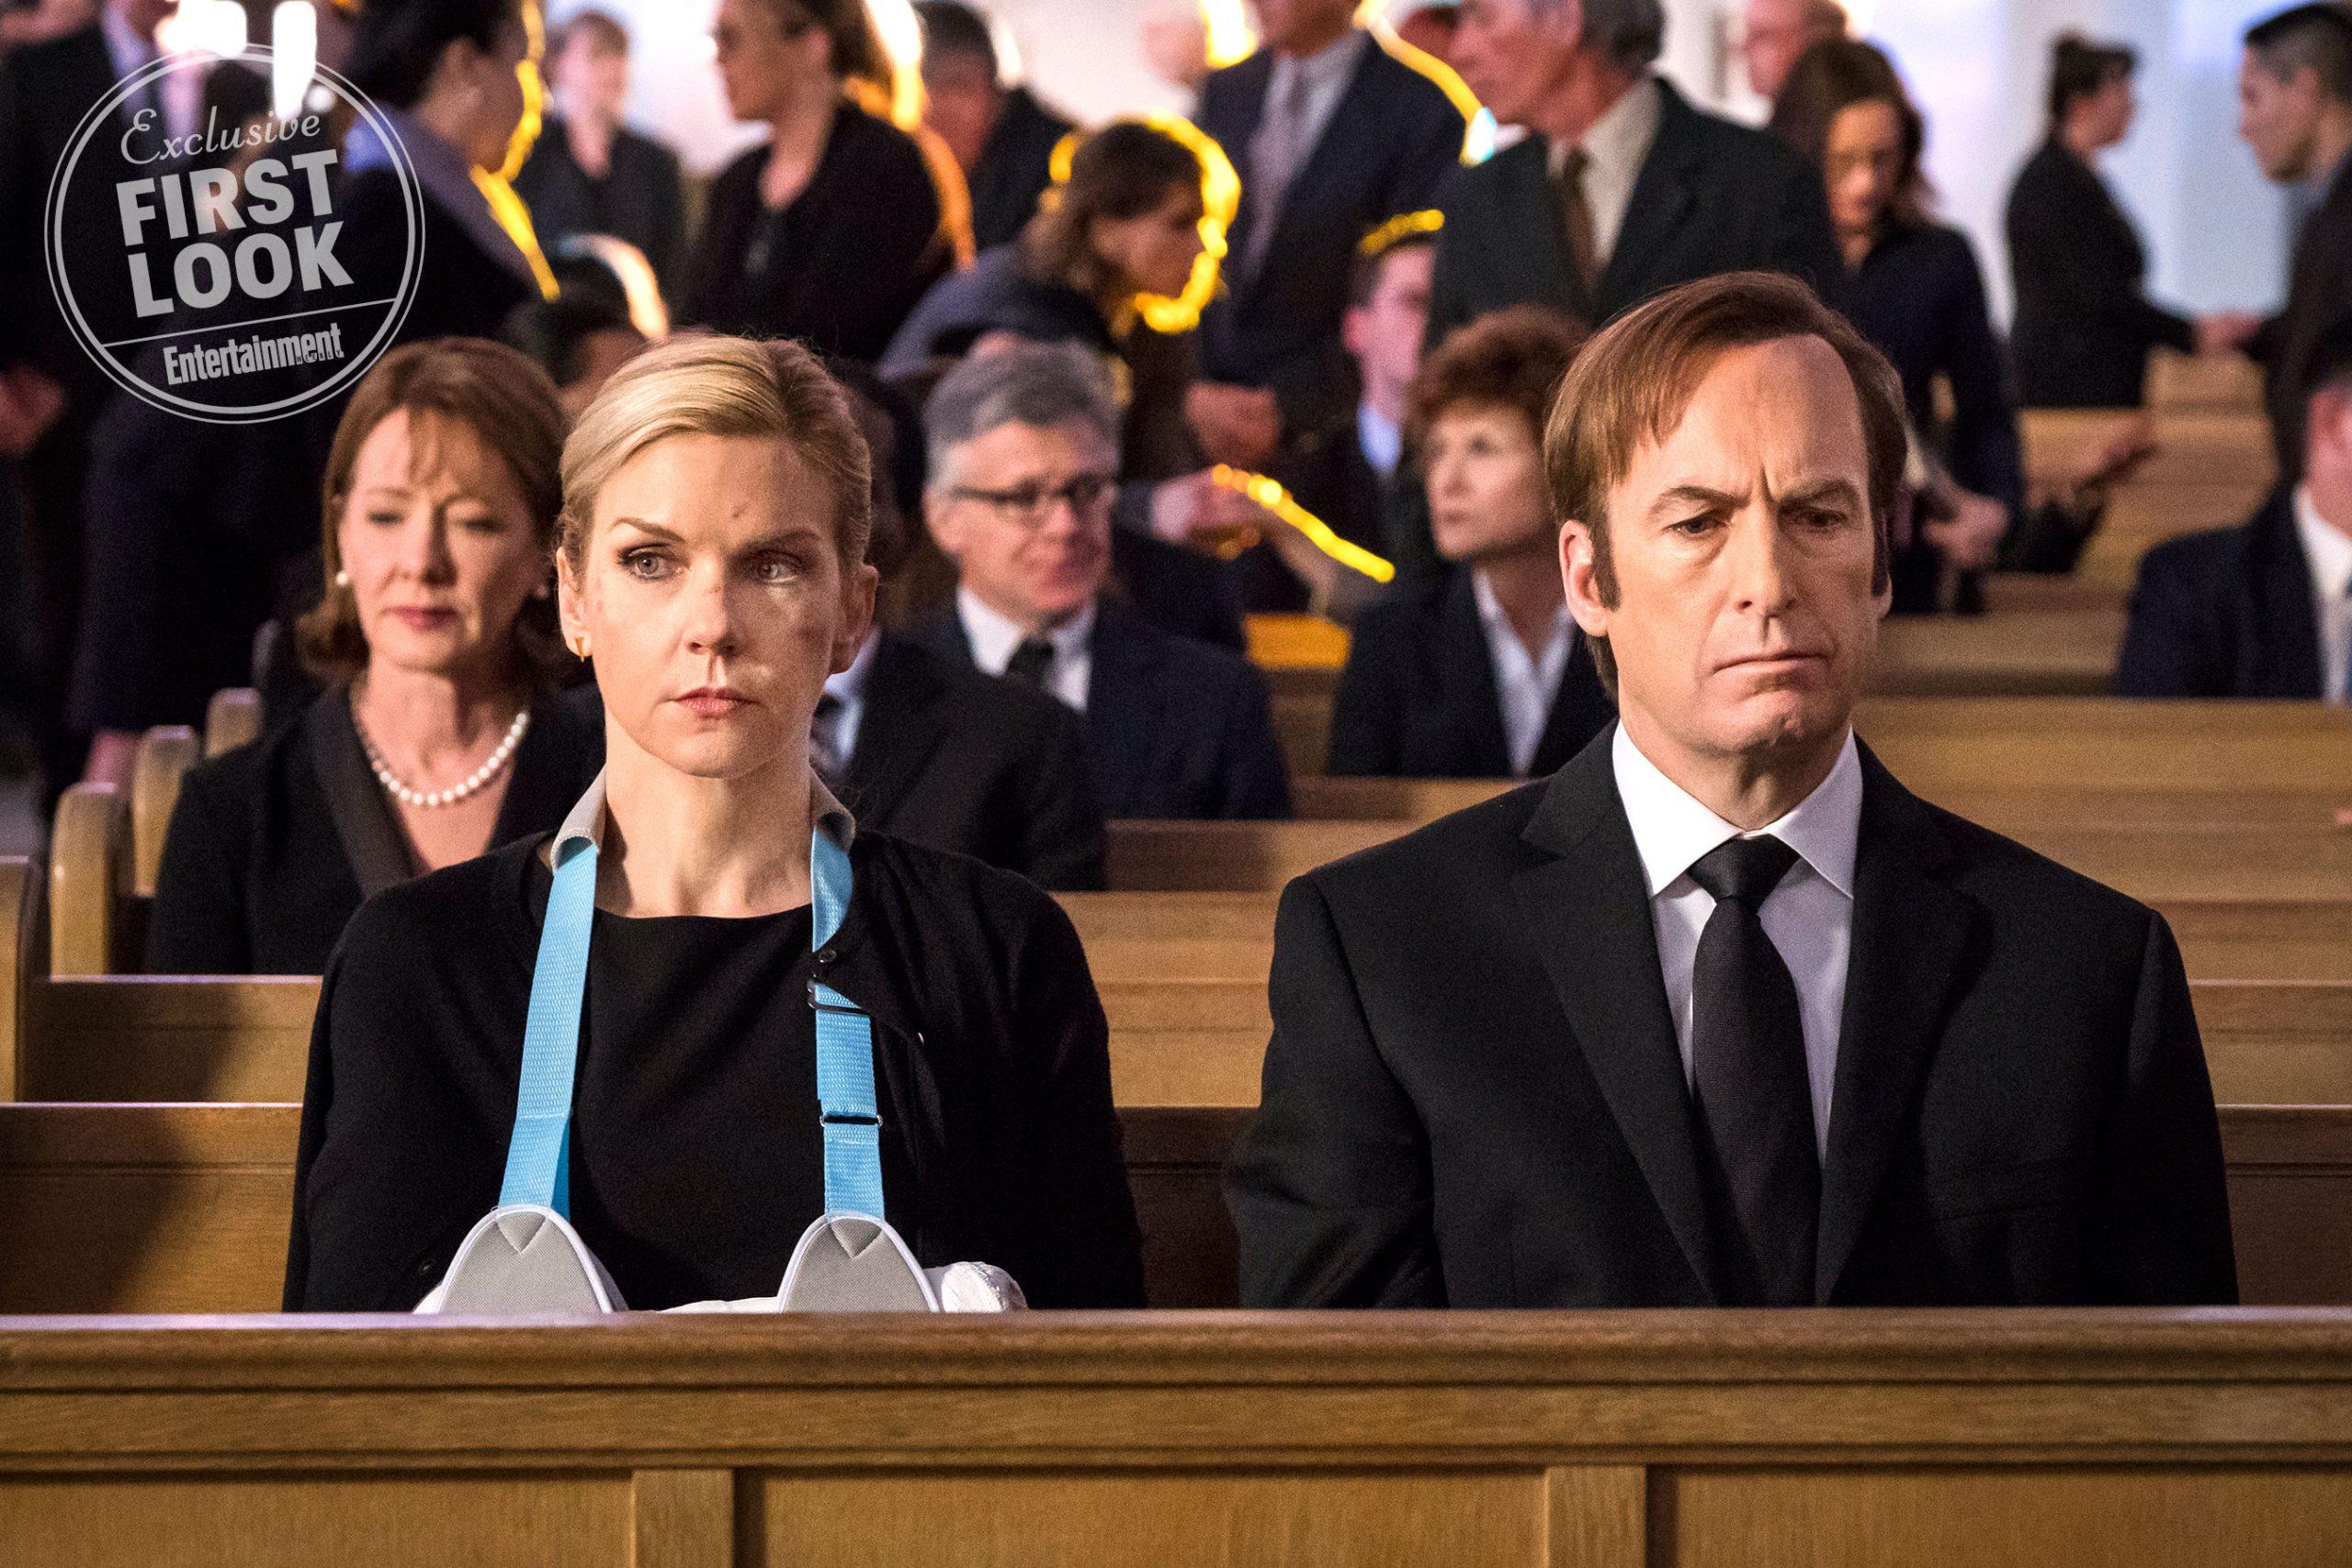 trailer: Better Call Saul returns on August 6